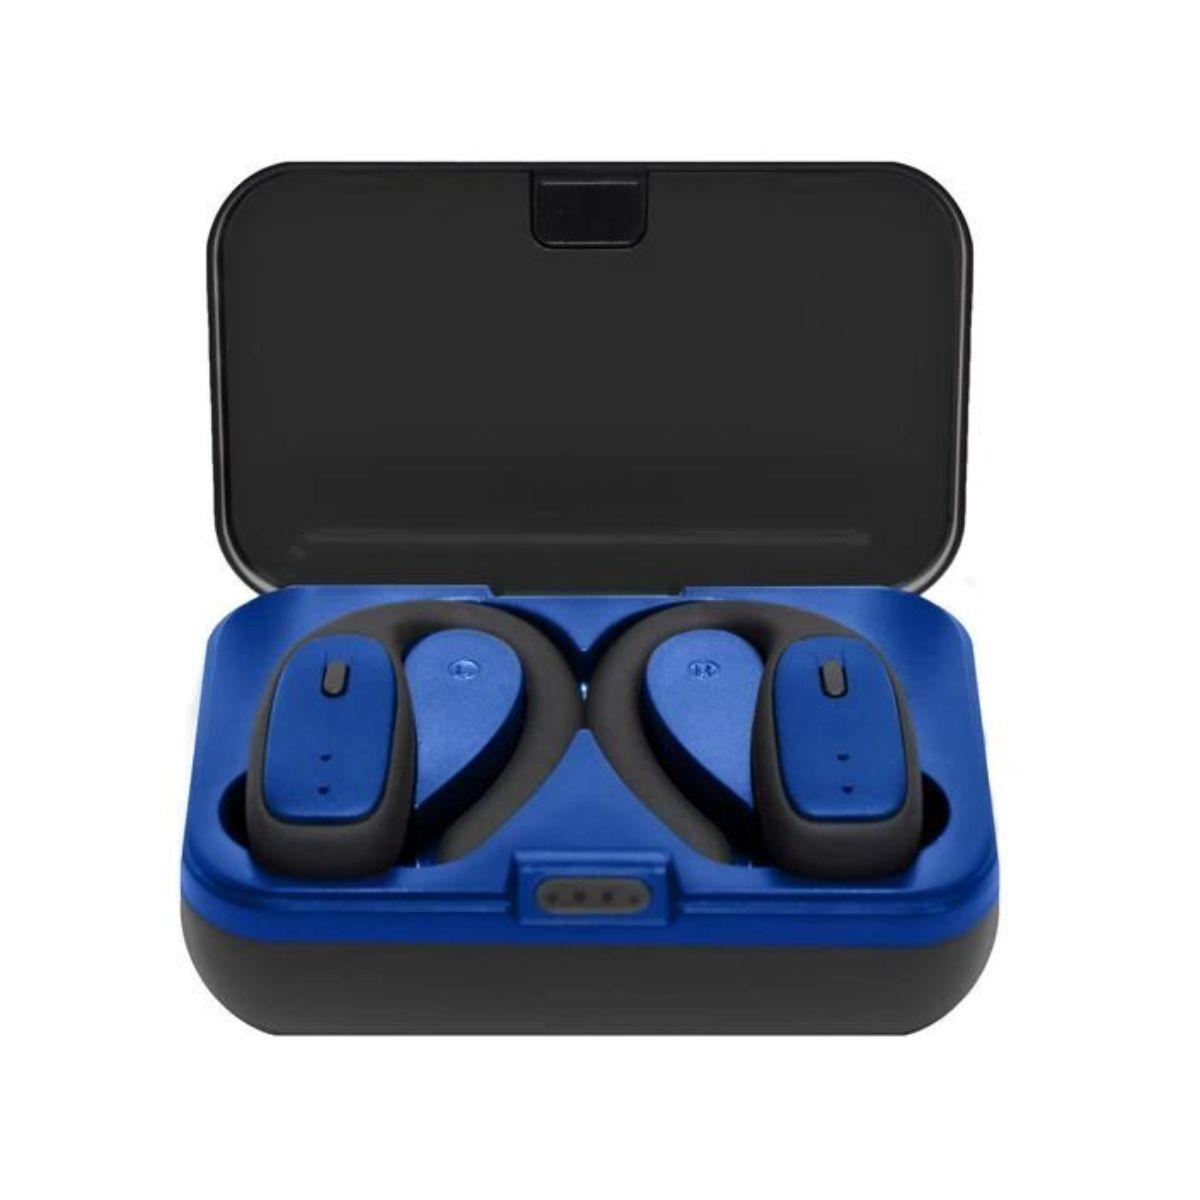 auriculares inalambricos tws flex 4 1